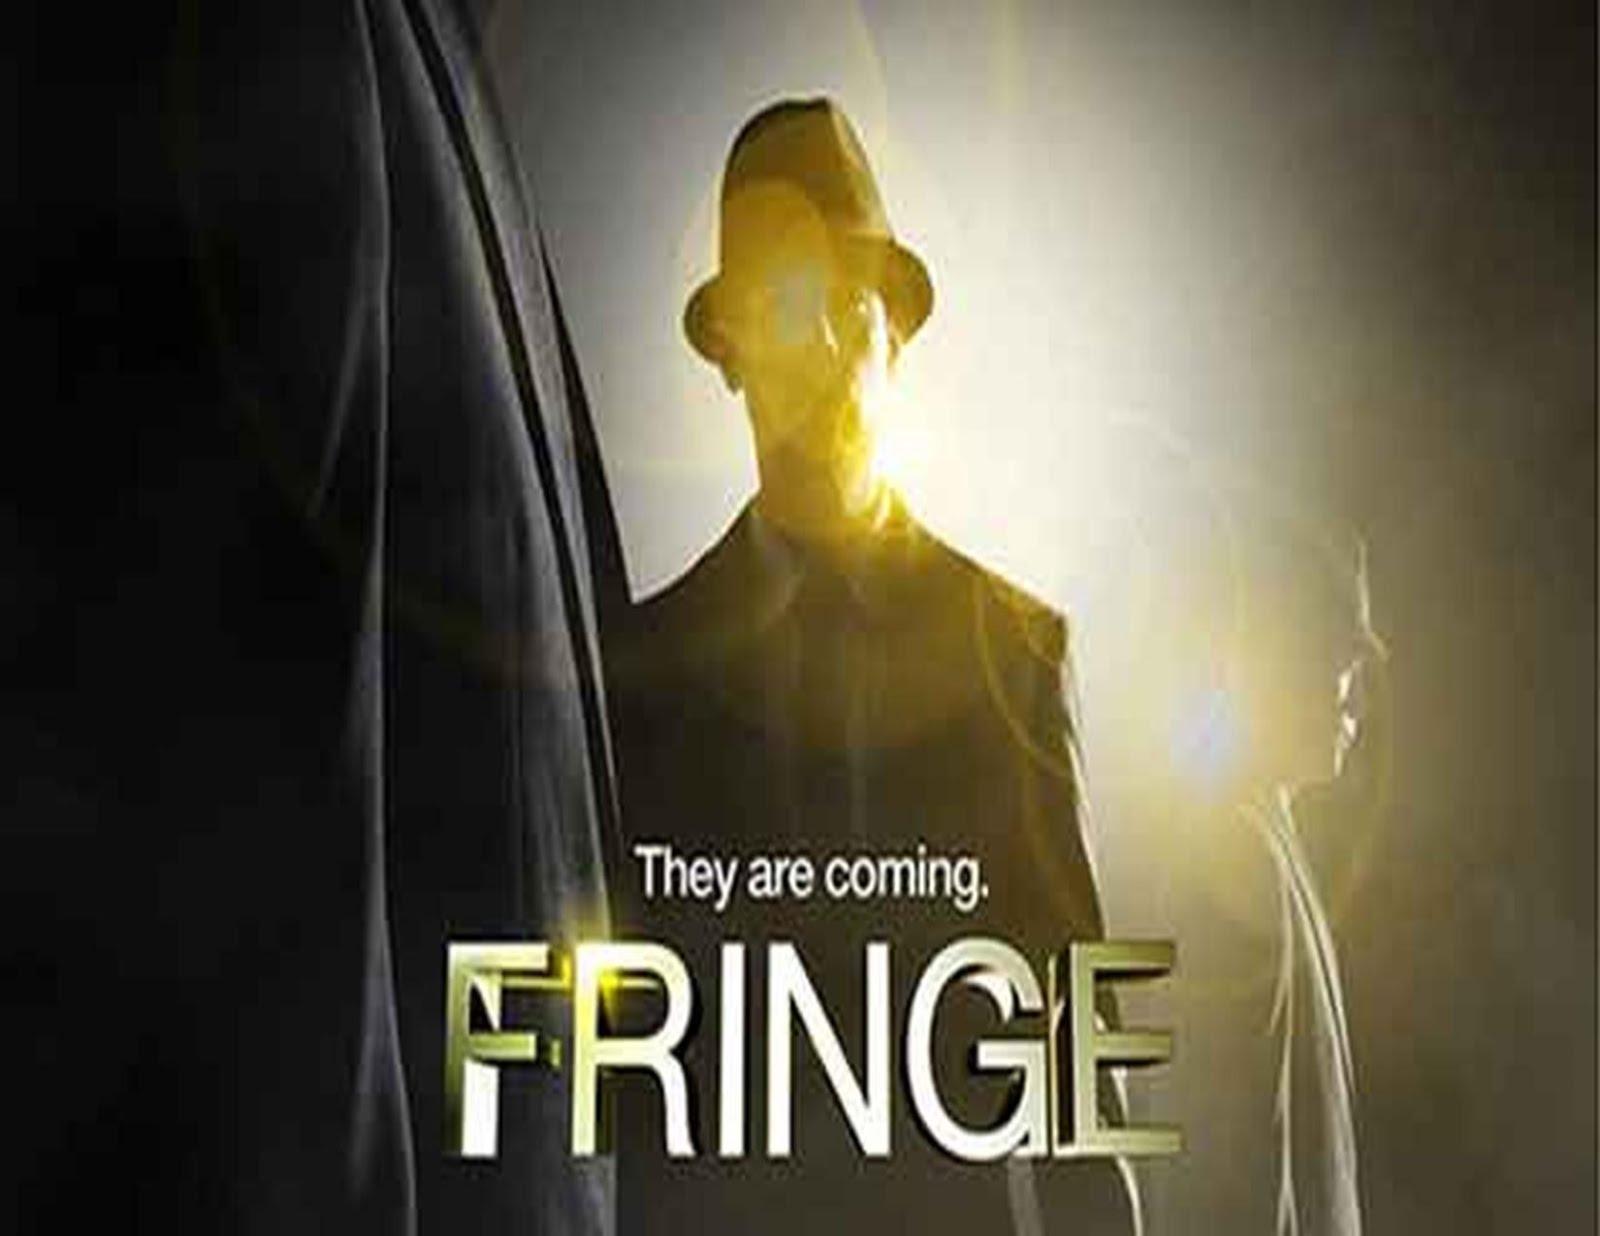 Fringe - S 1 E 1 - Pilot - Part 01 - video dailymotion